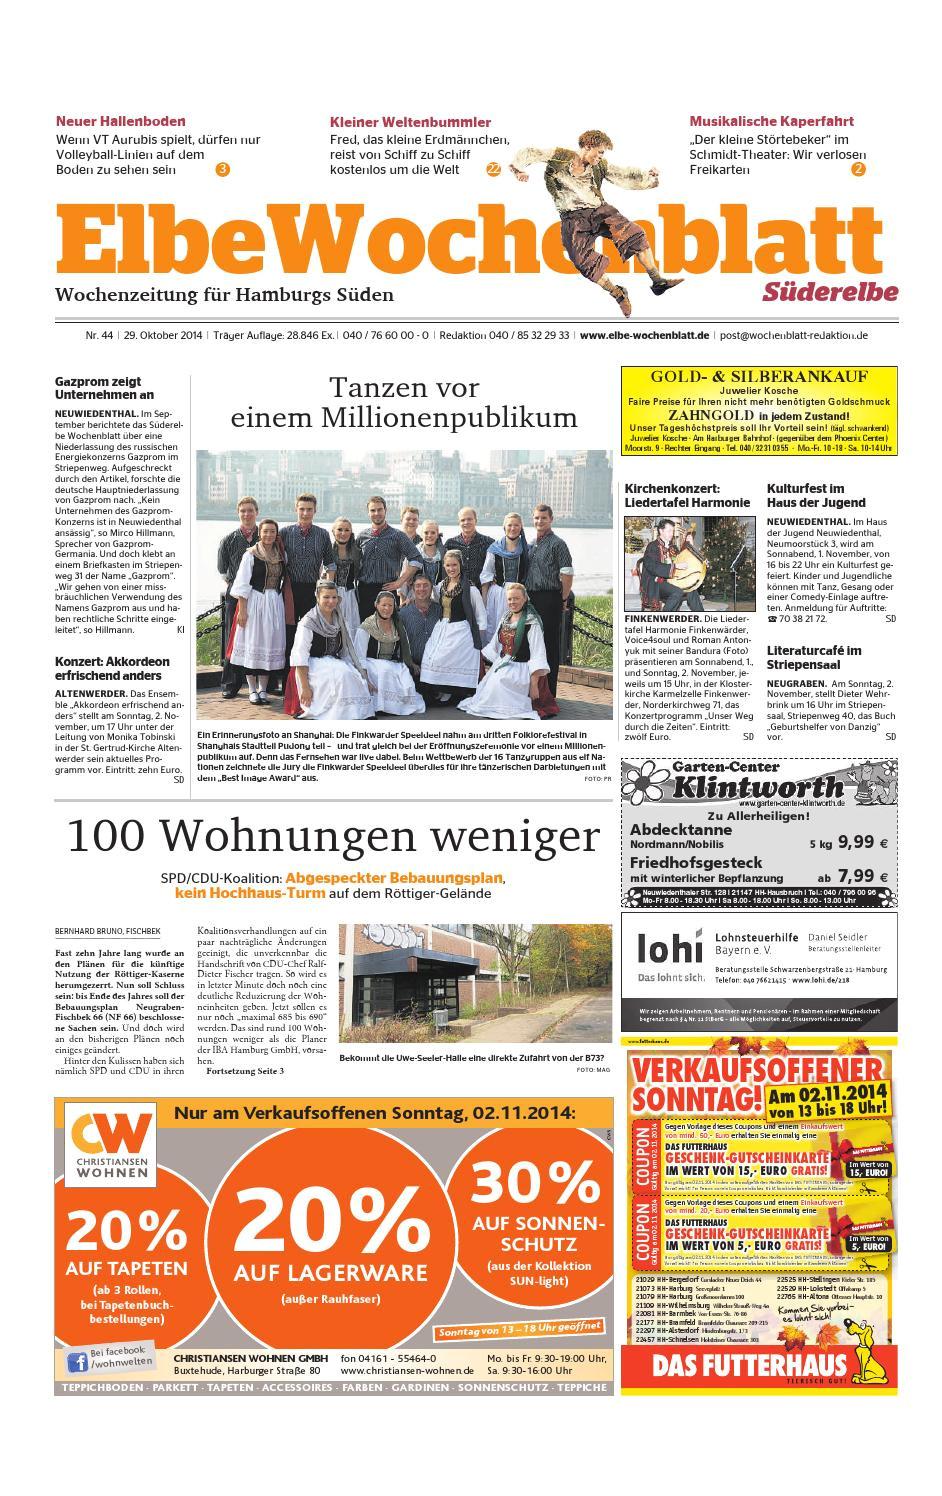 suderelbe kw44 2014 by elbe wochenblatt verlagsgesellschaft mbh co kg issuu